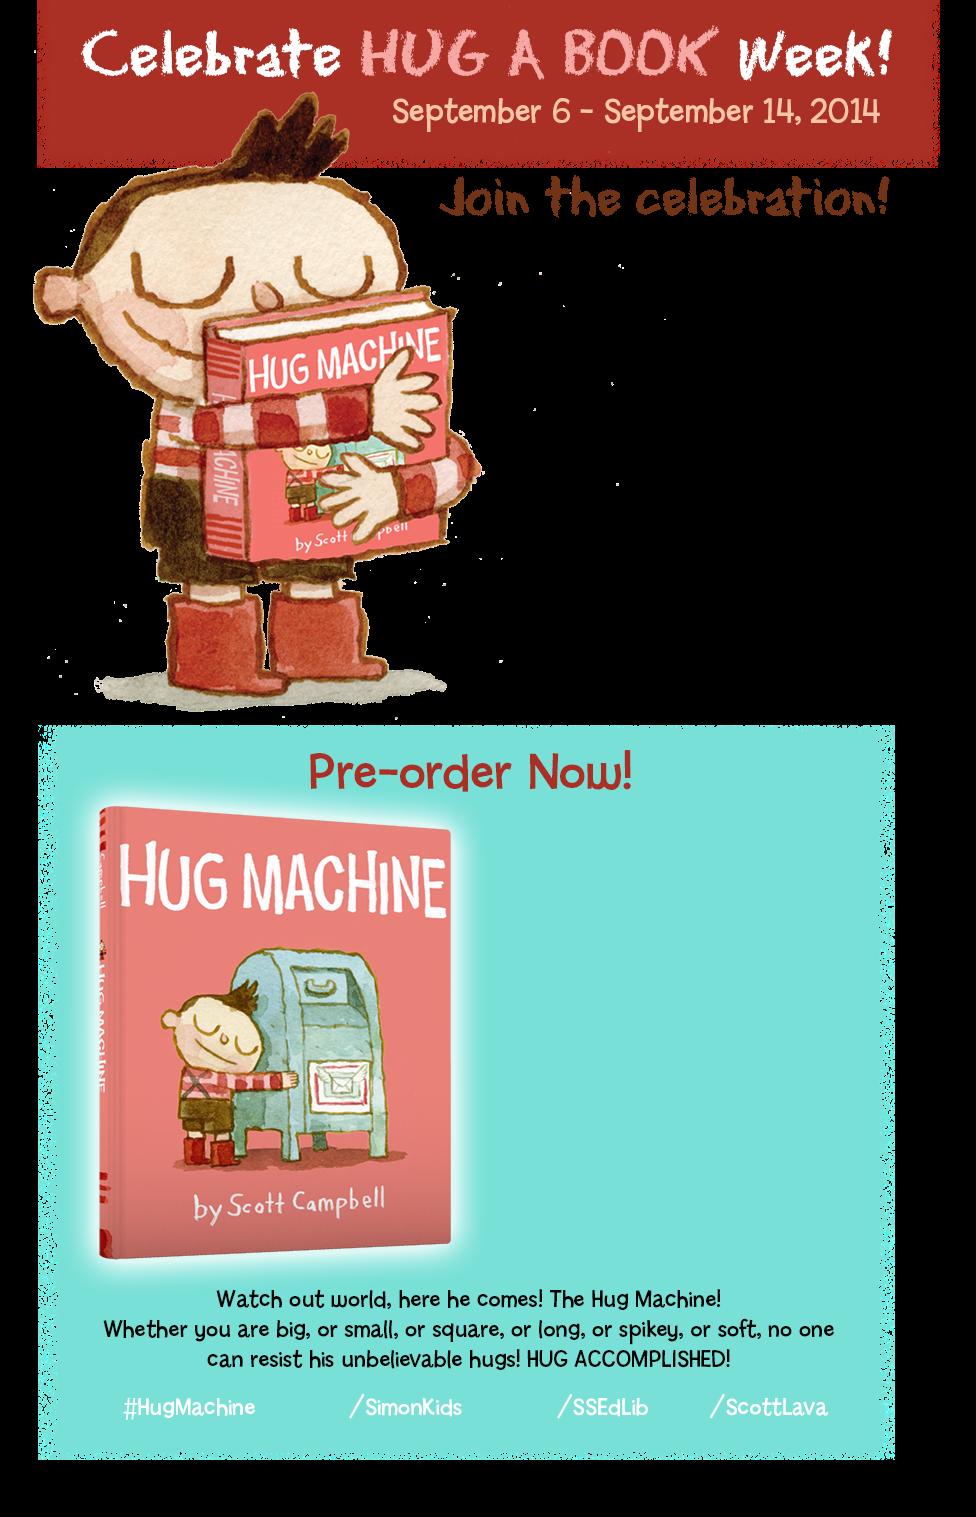 the hug machine book